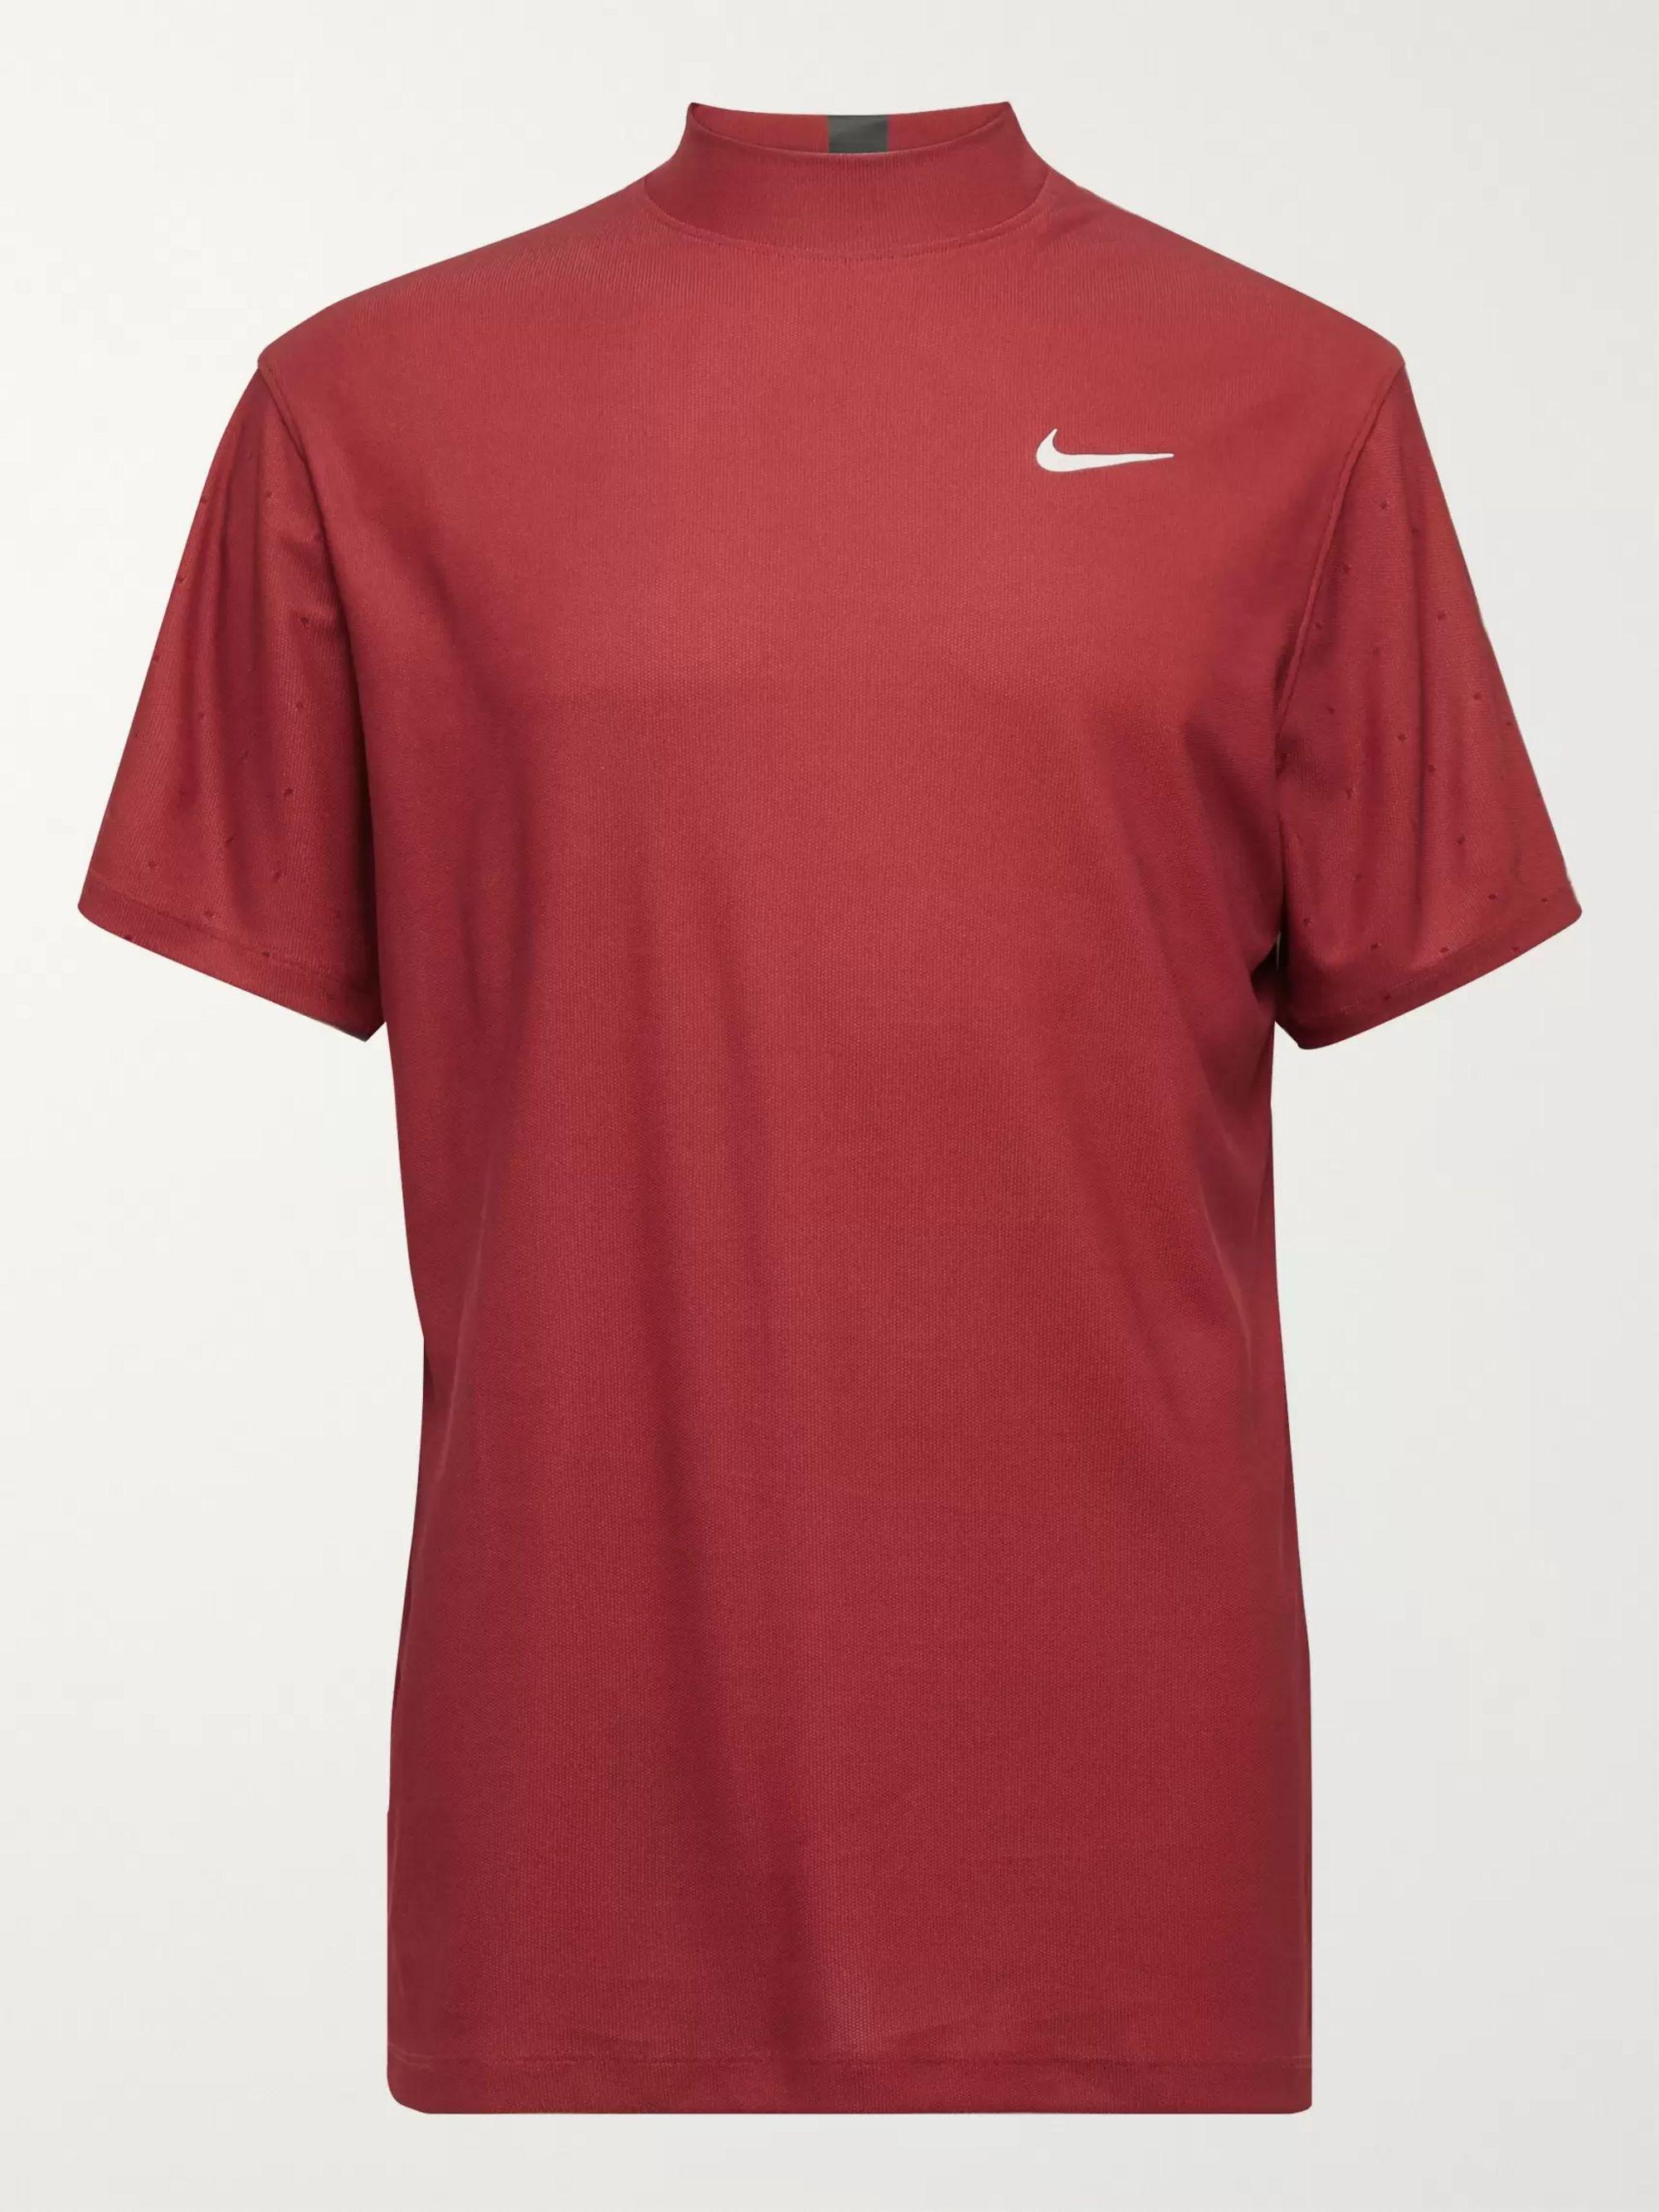 Nike Golf Tiger Woods Dri-FIT Mock-Neck Golf Top